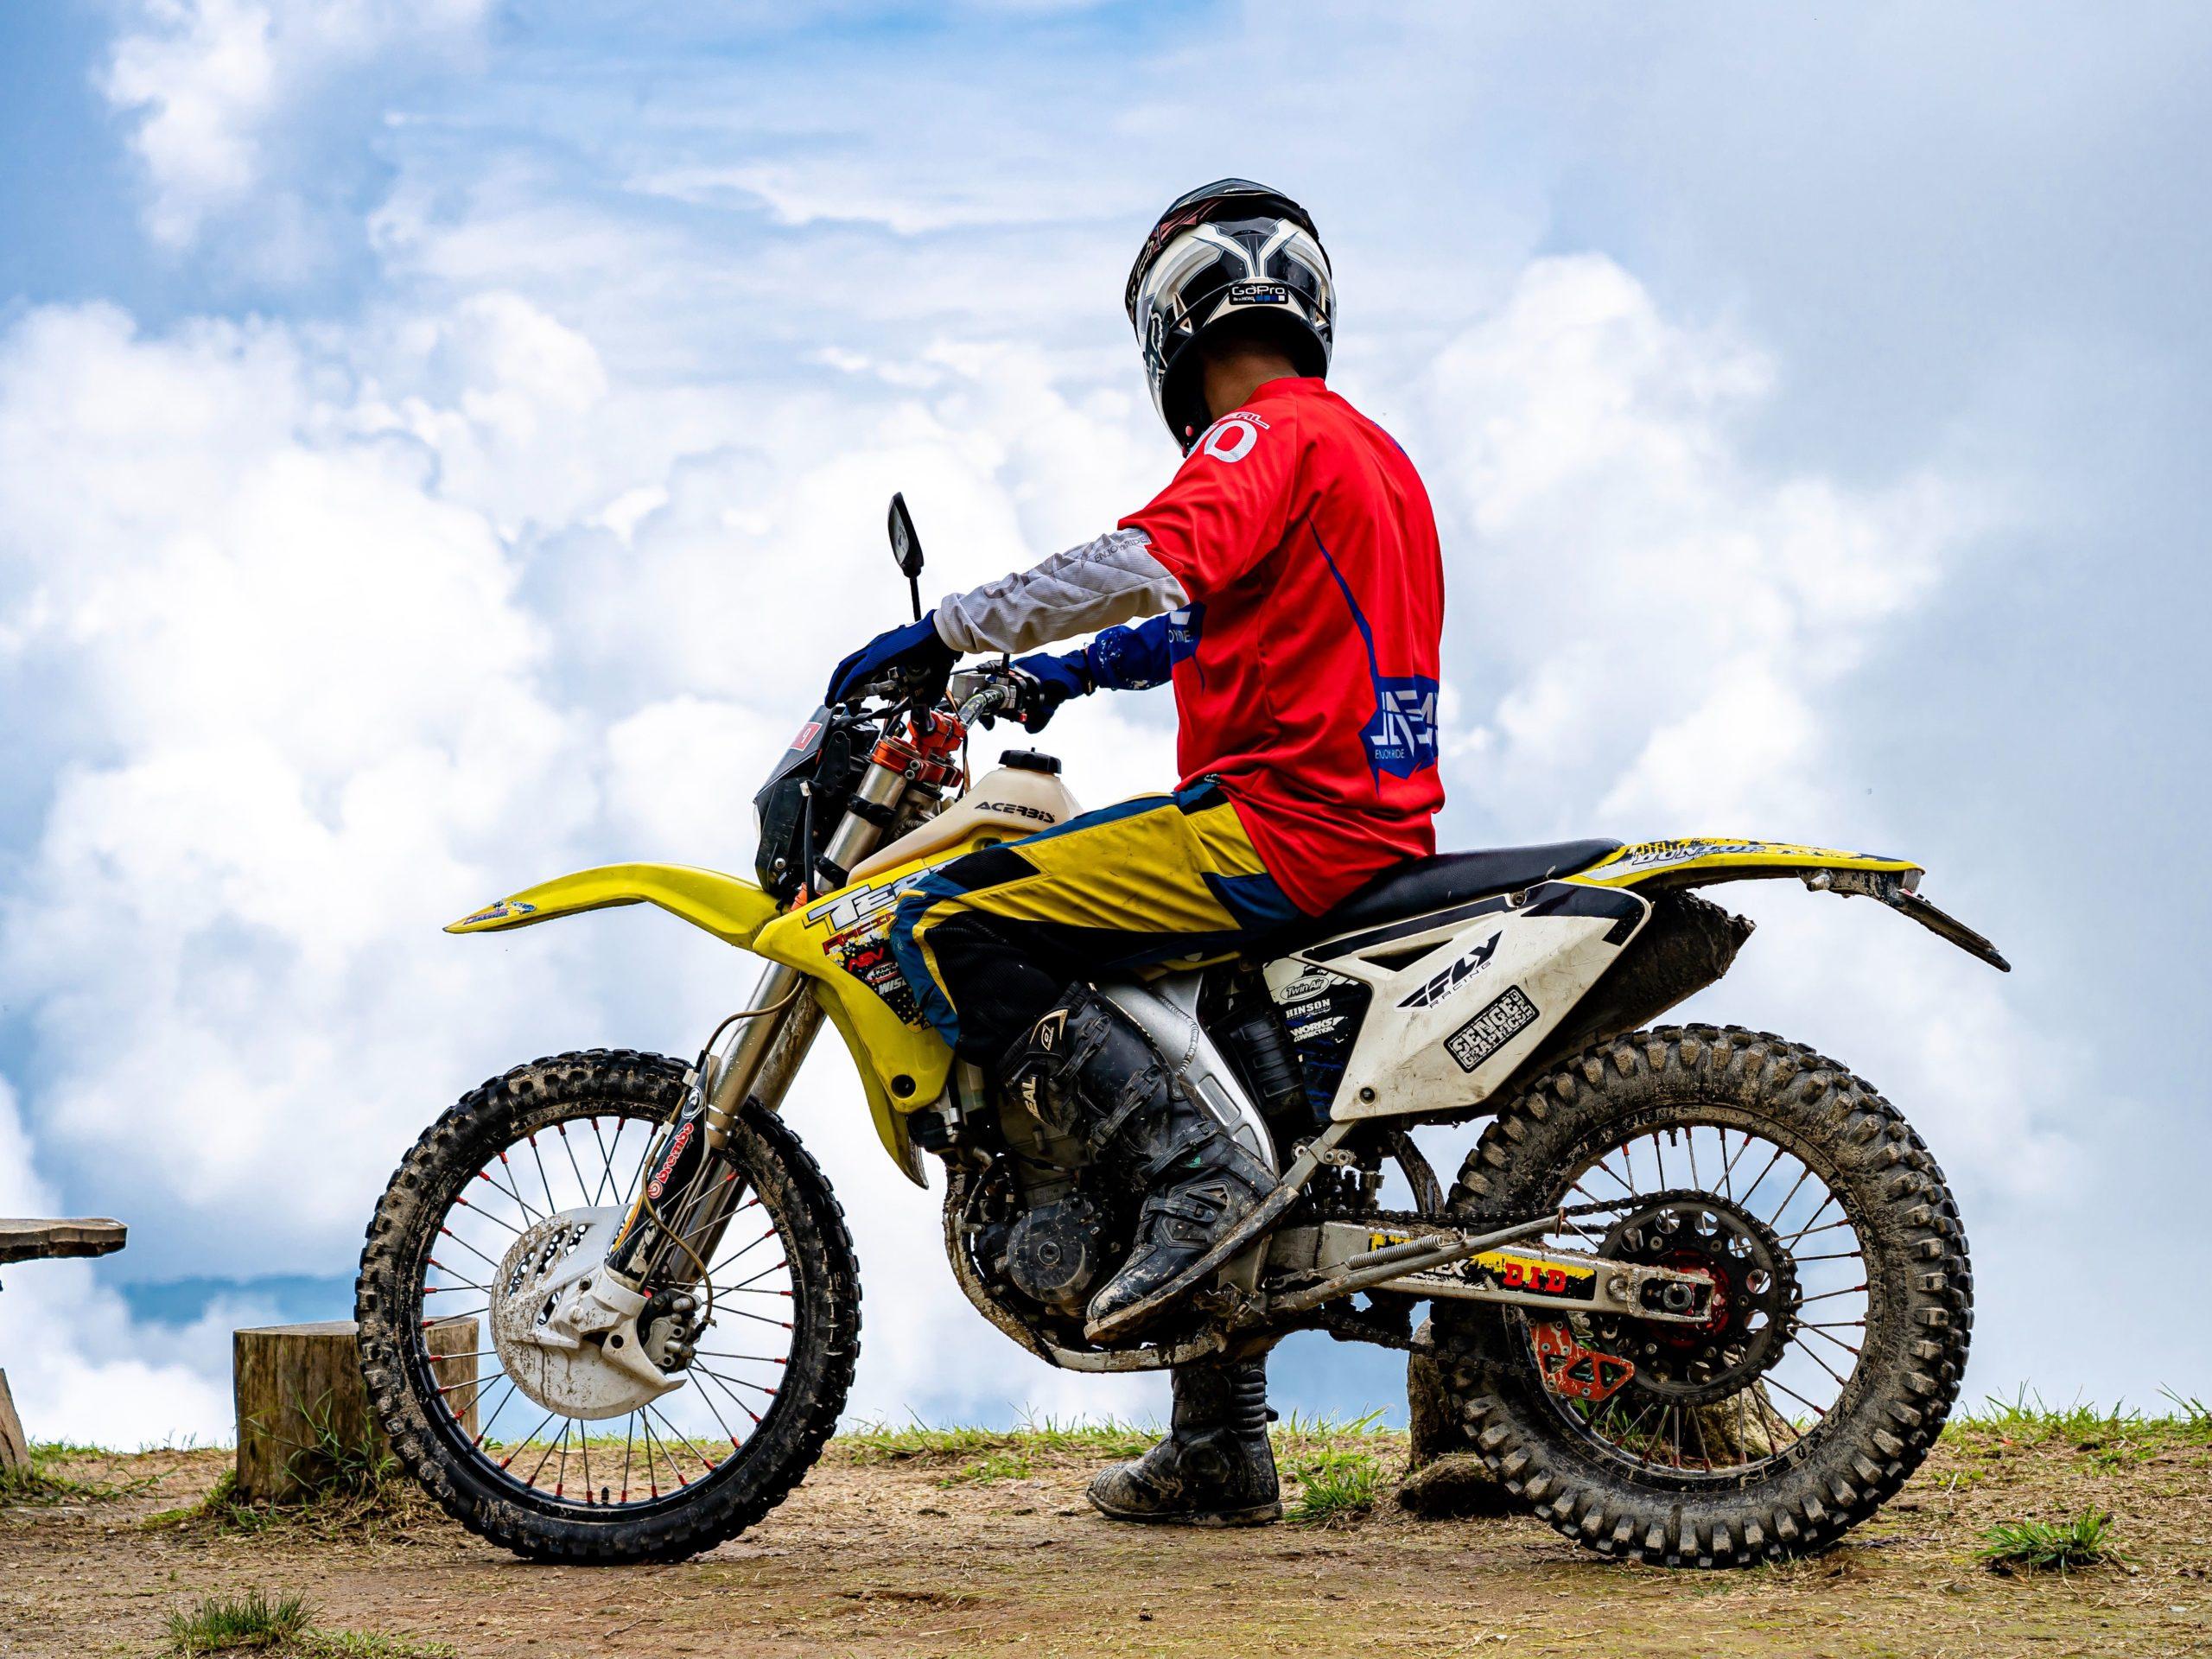 Best Knee Braces for Dirt Bike Riding